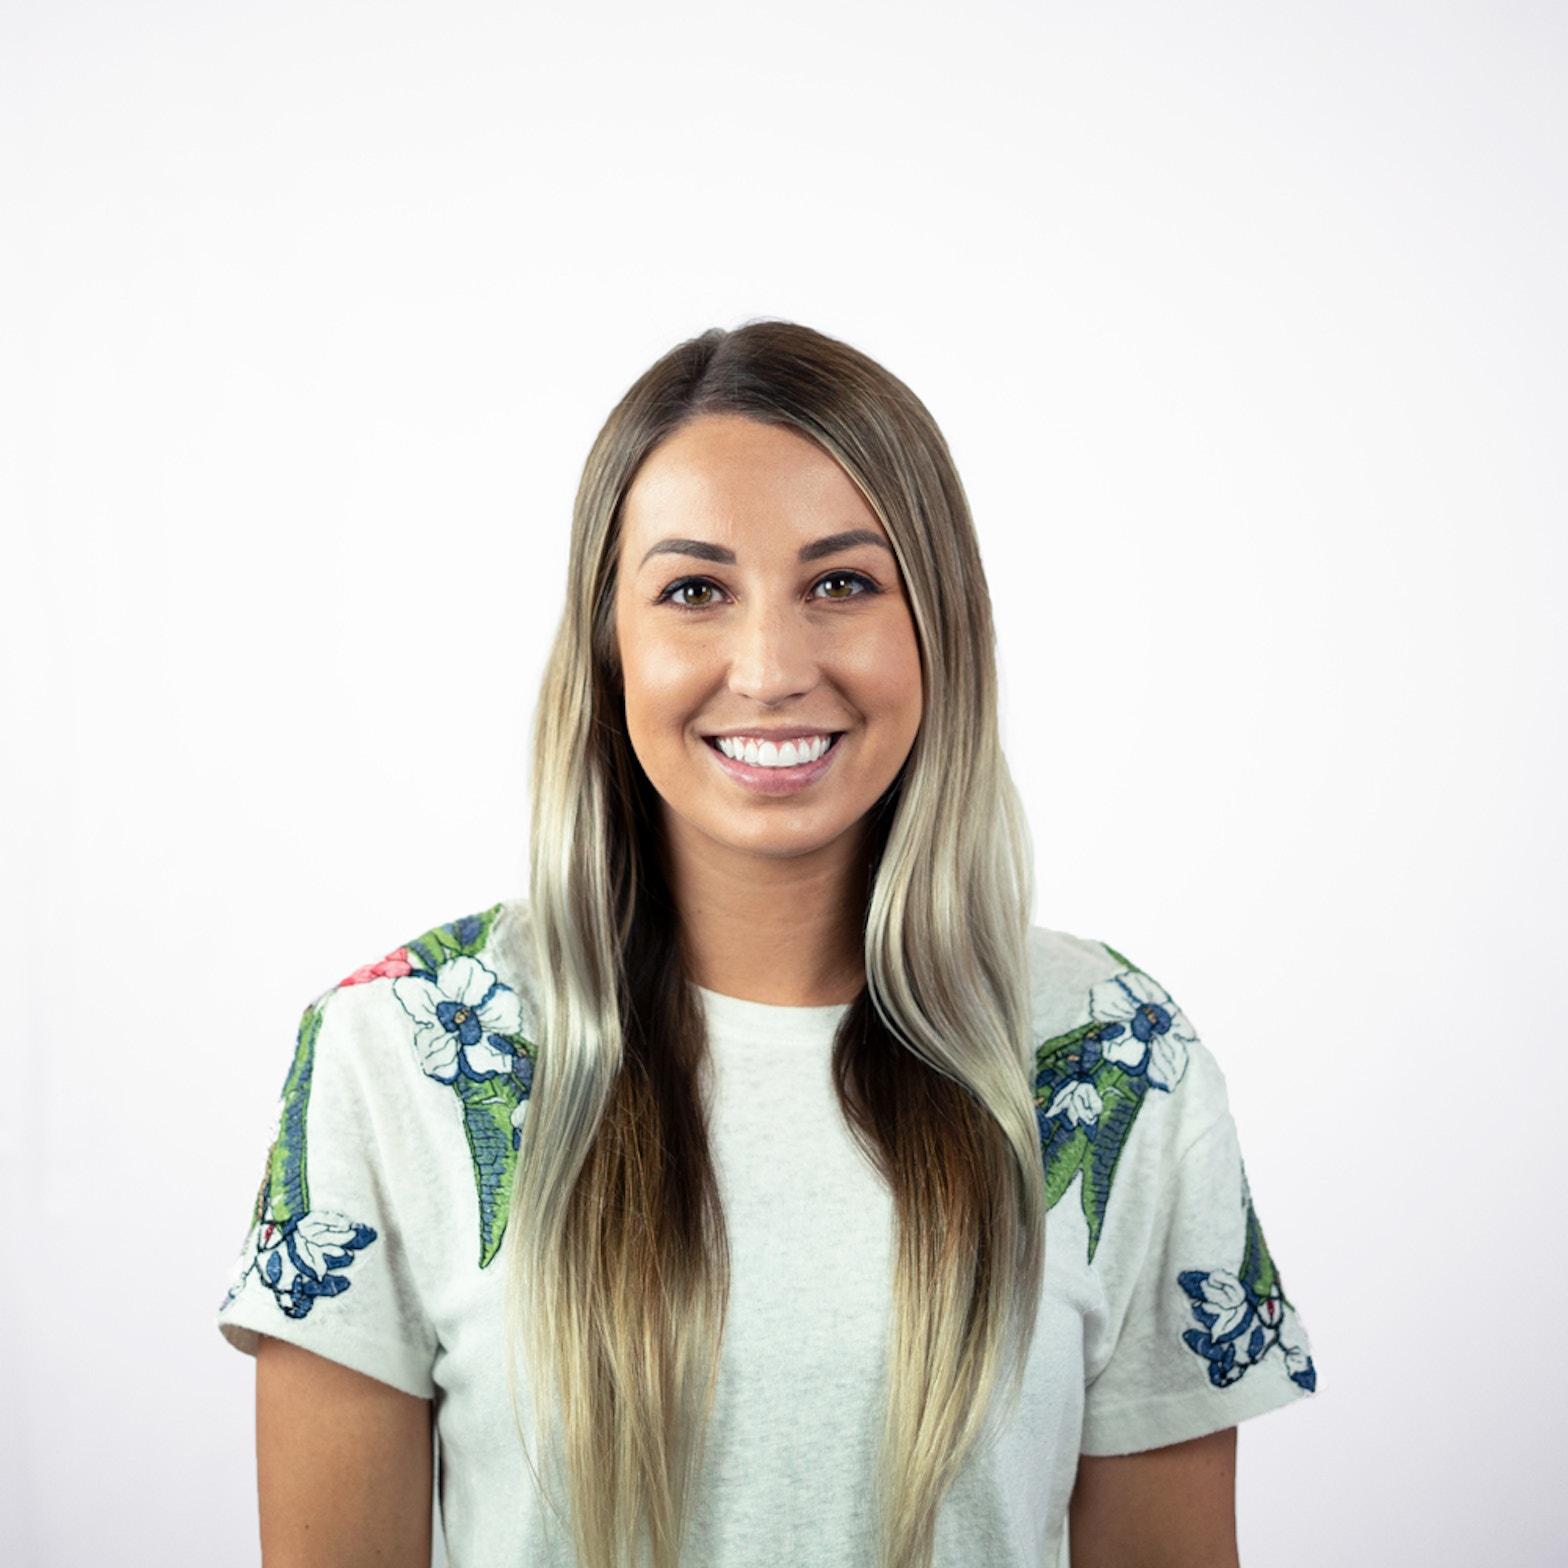 Portrait of Alexa Huston